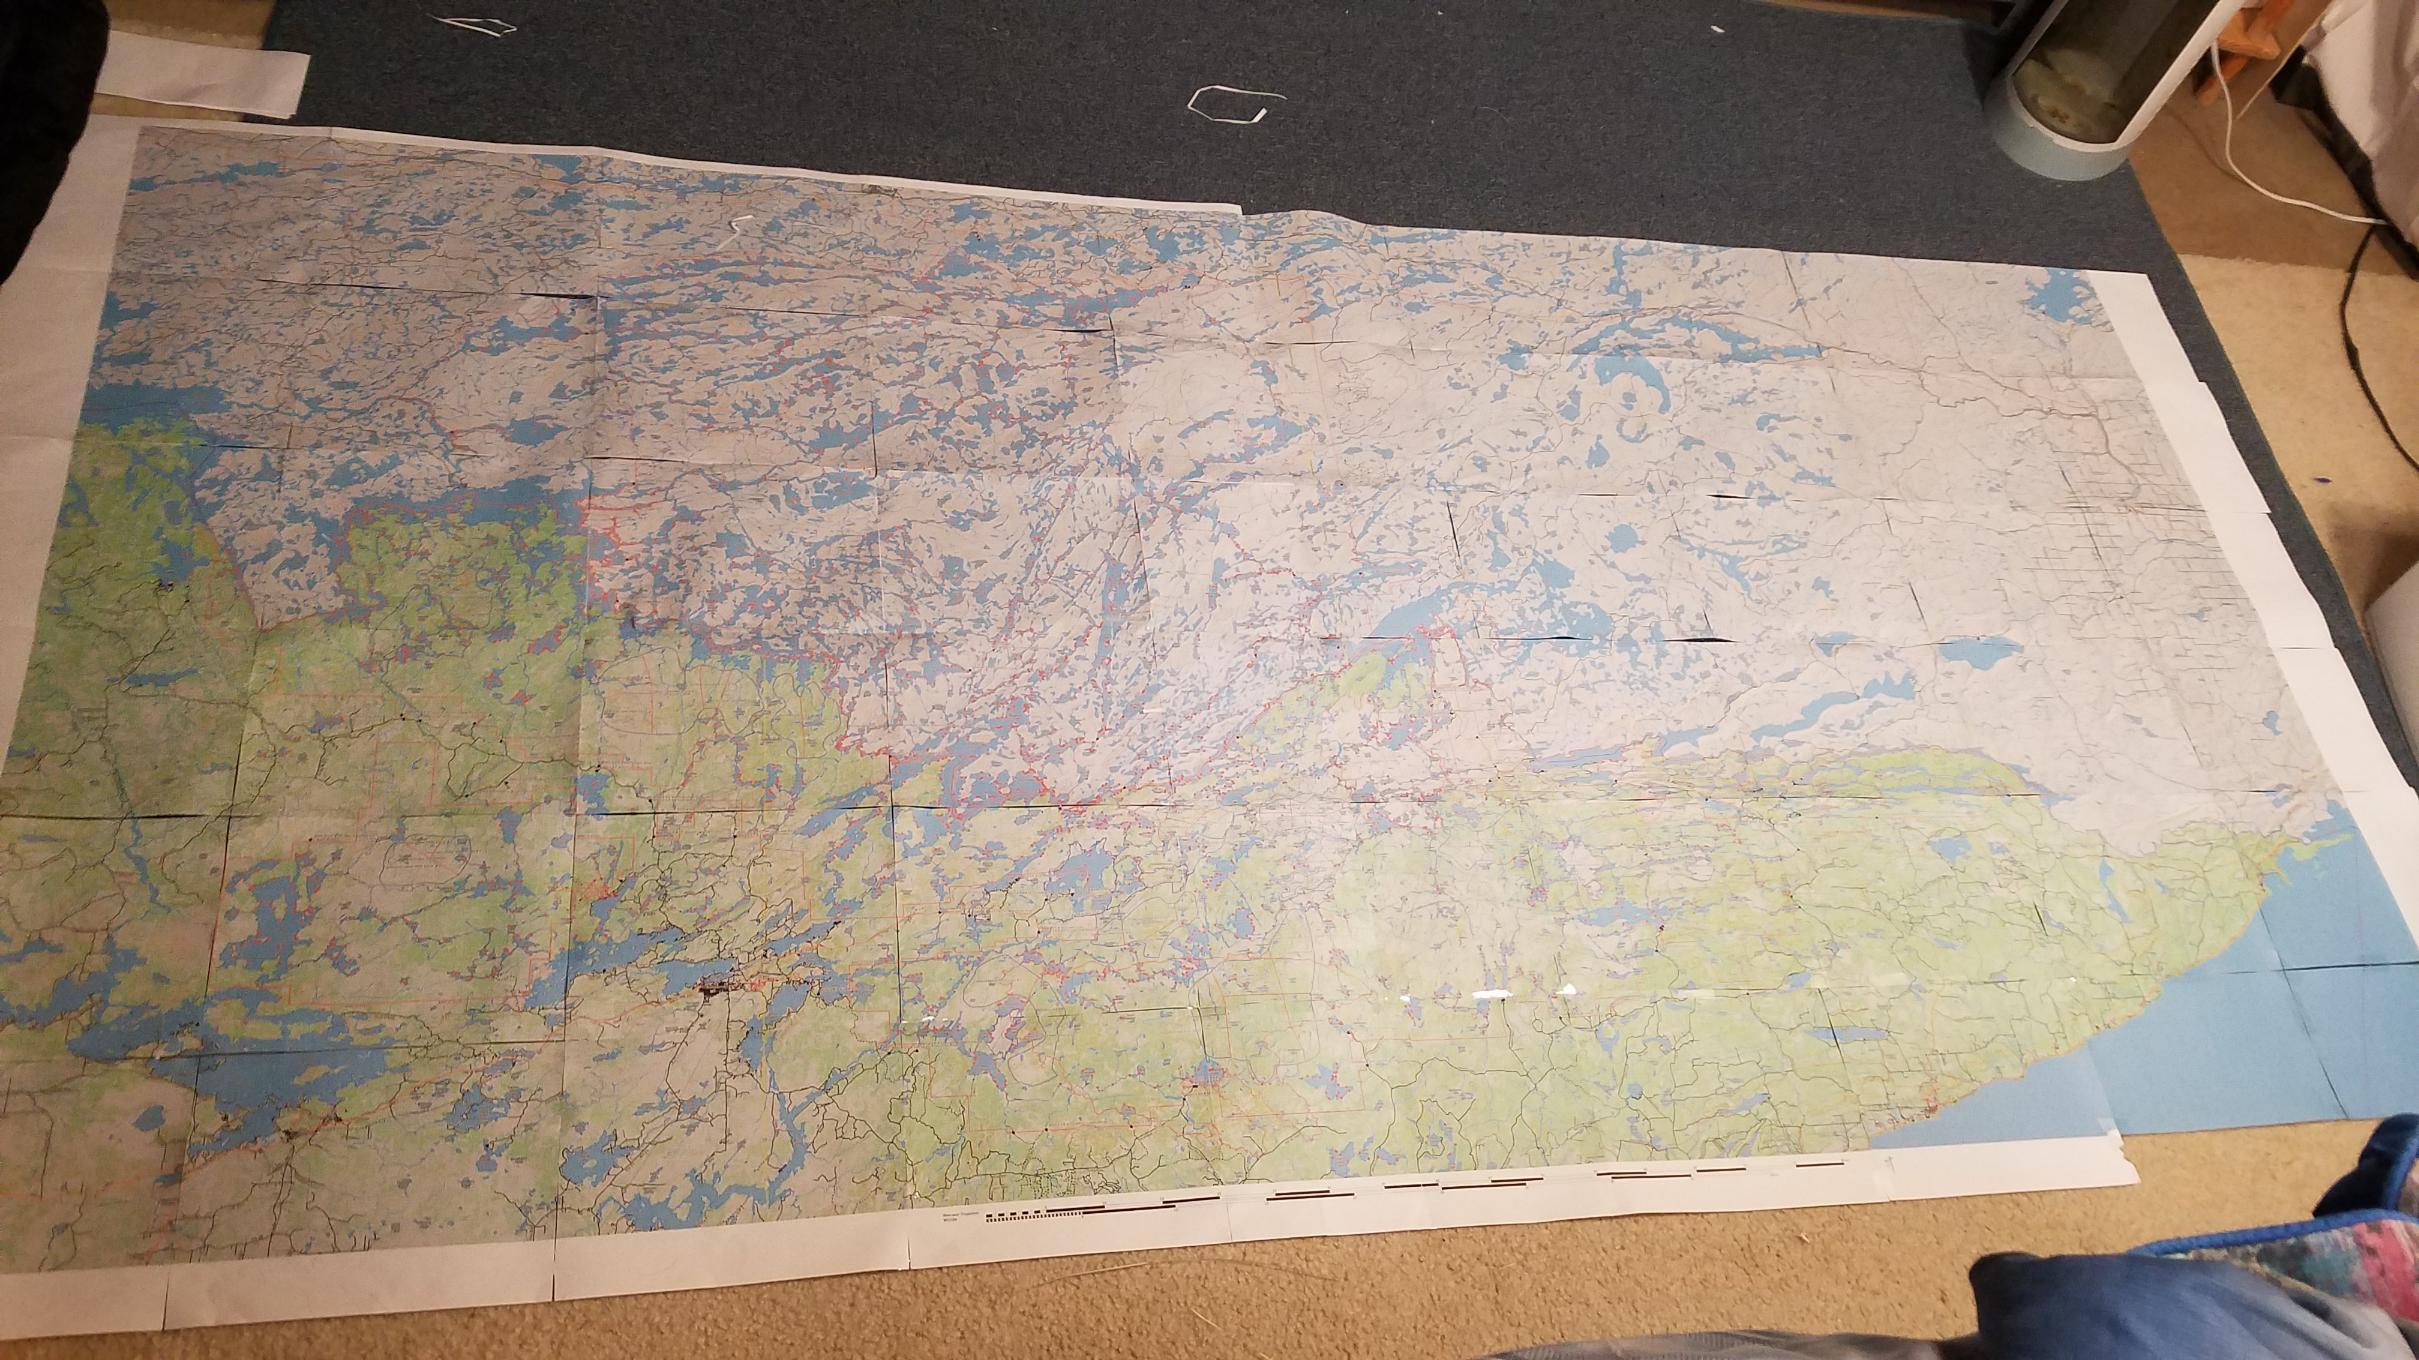 BWCA 94' x 48' Map